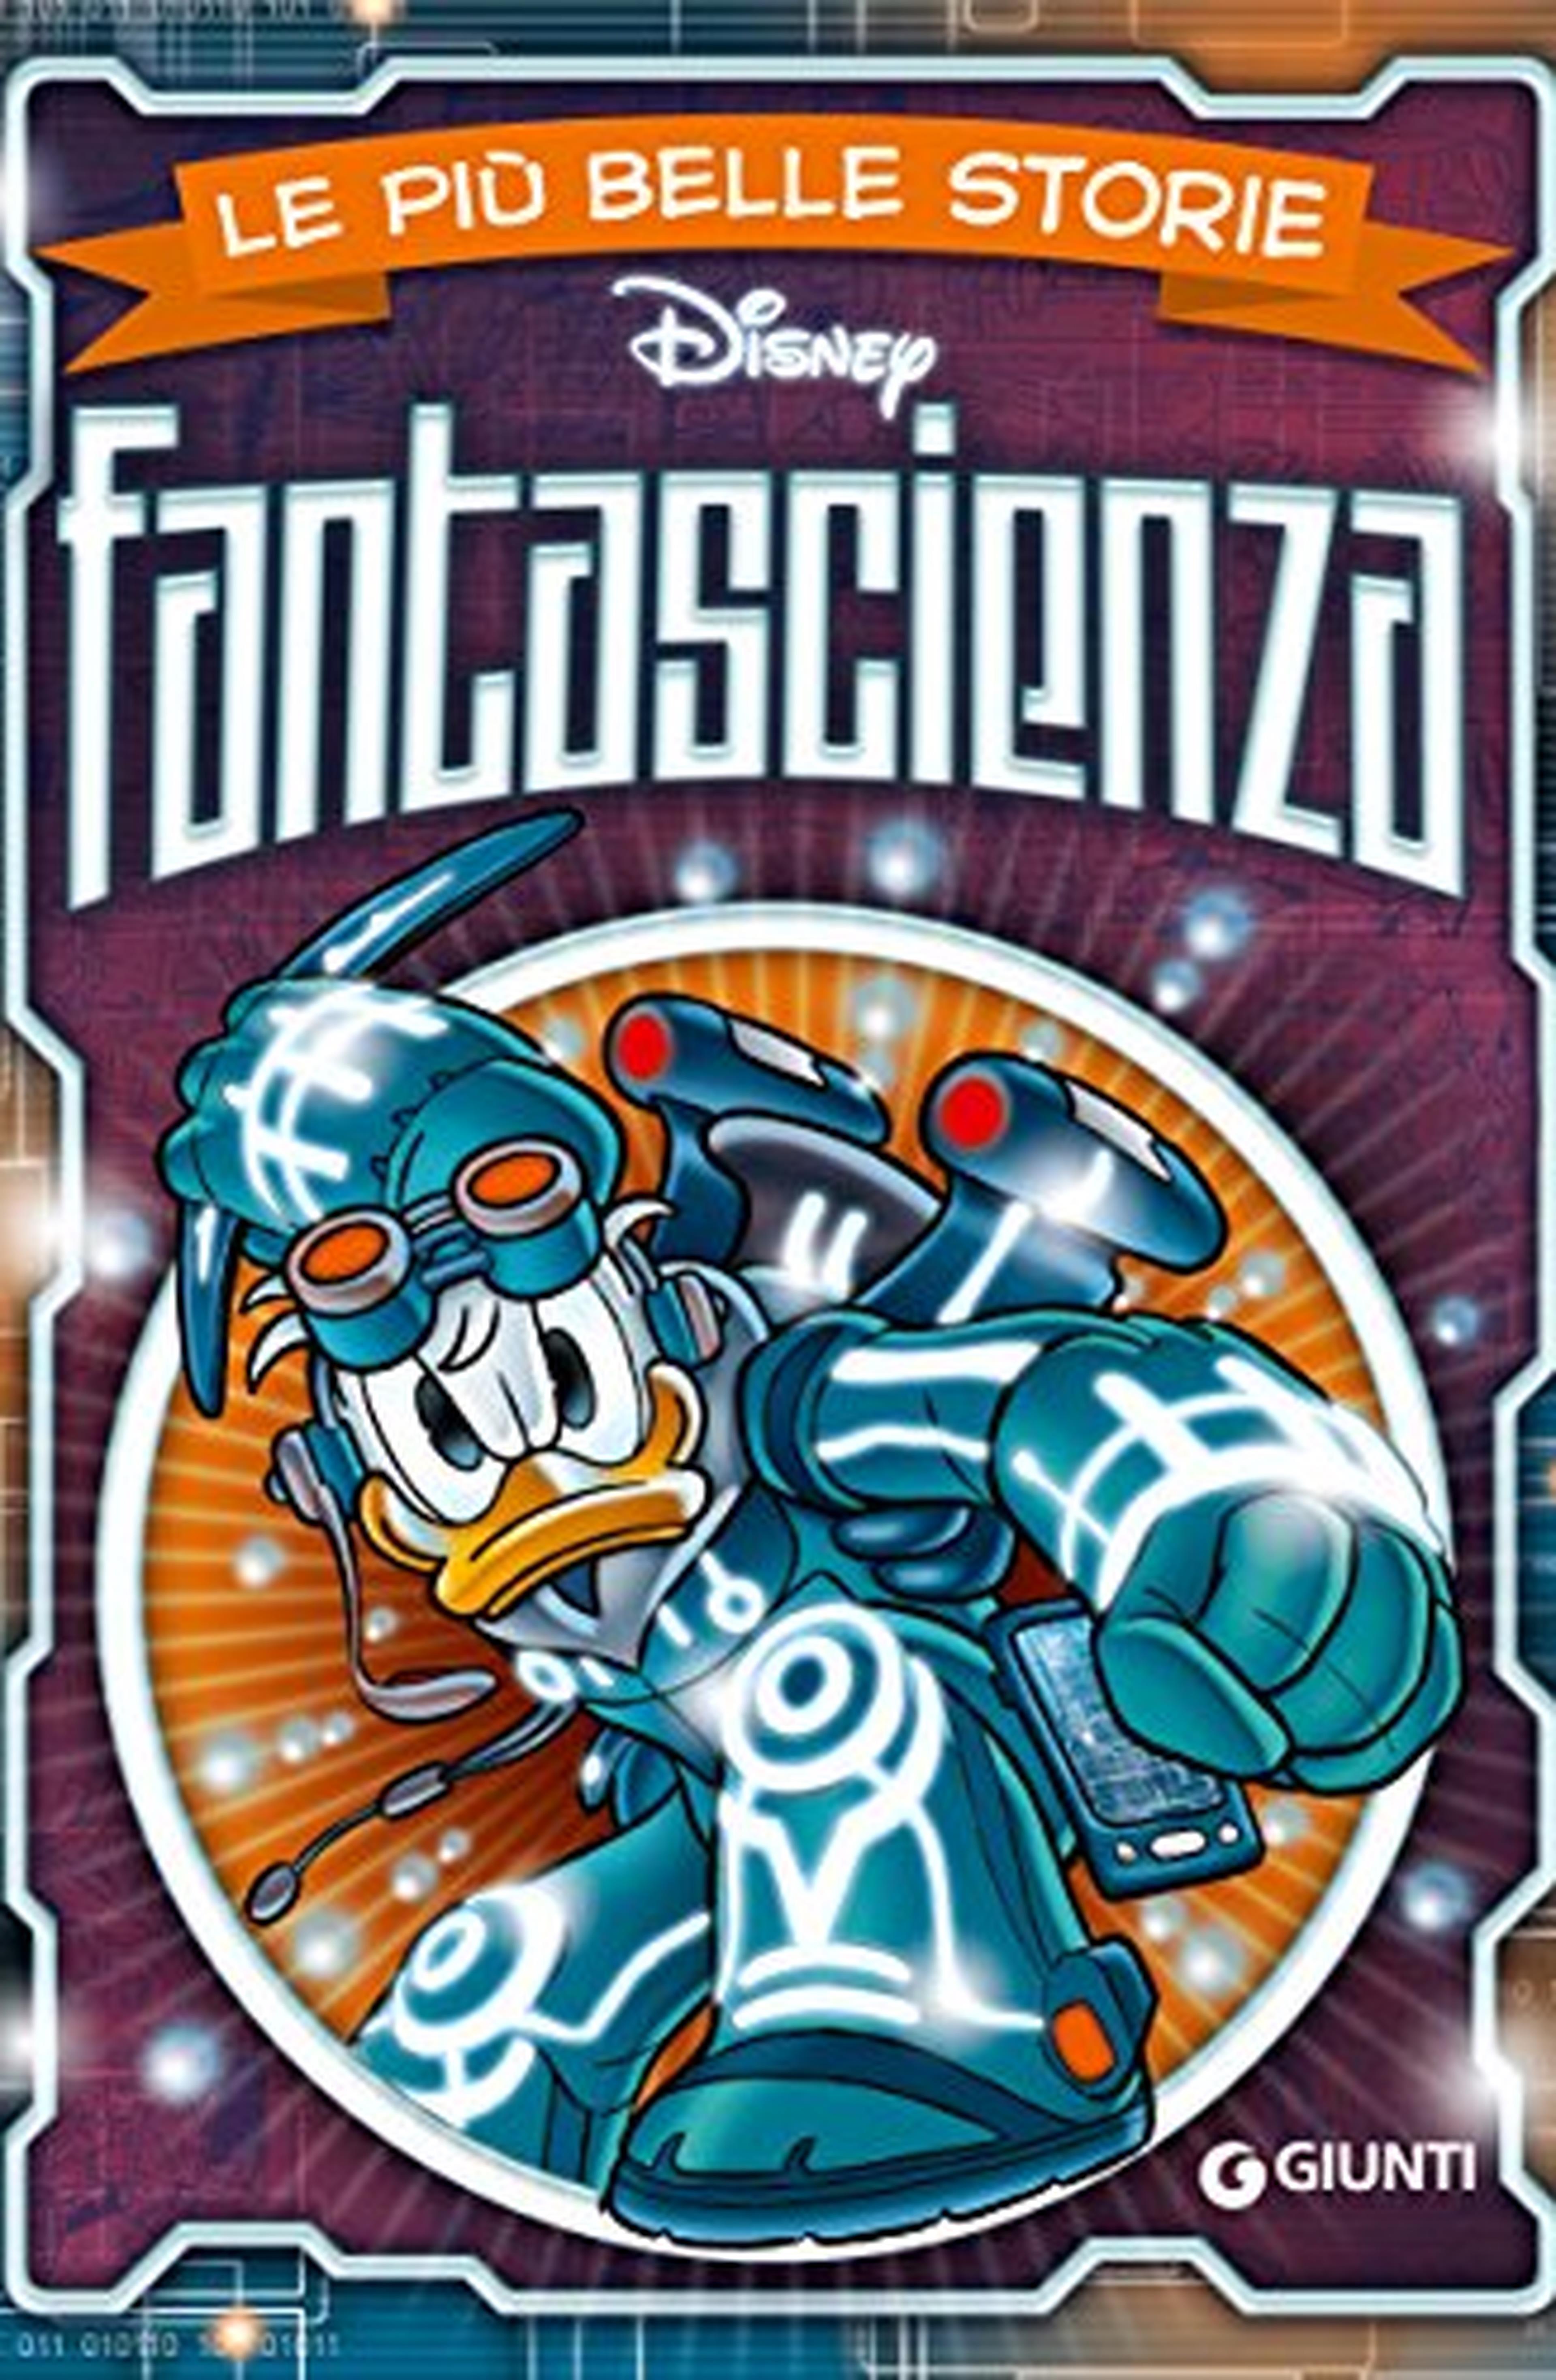 Le più belle storie di Fantascienza (Storie a fumetti Vol. 11)